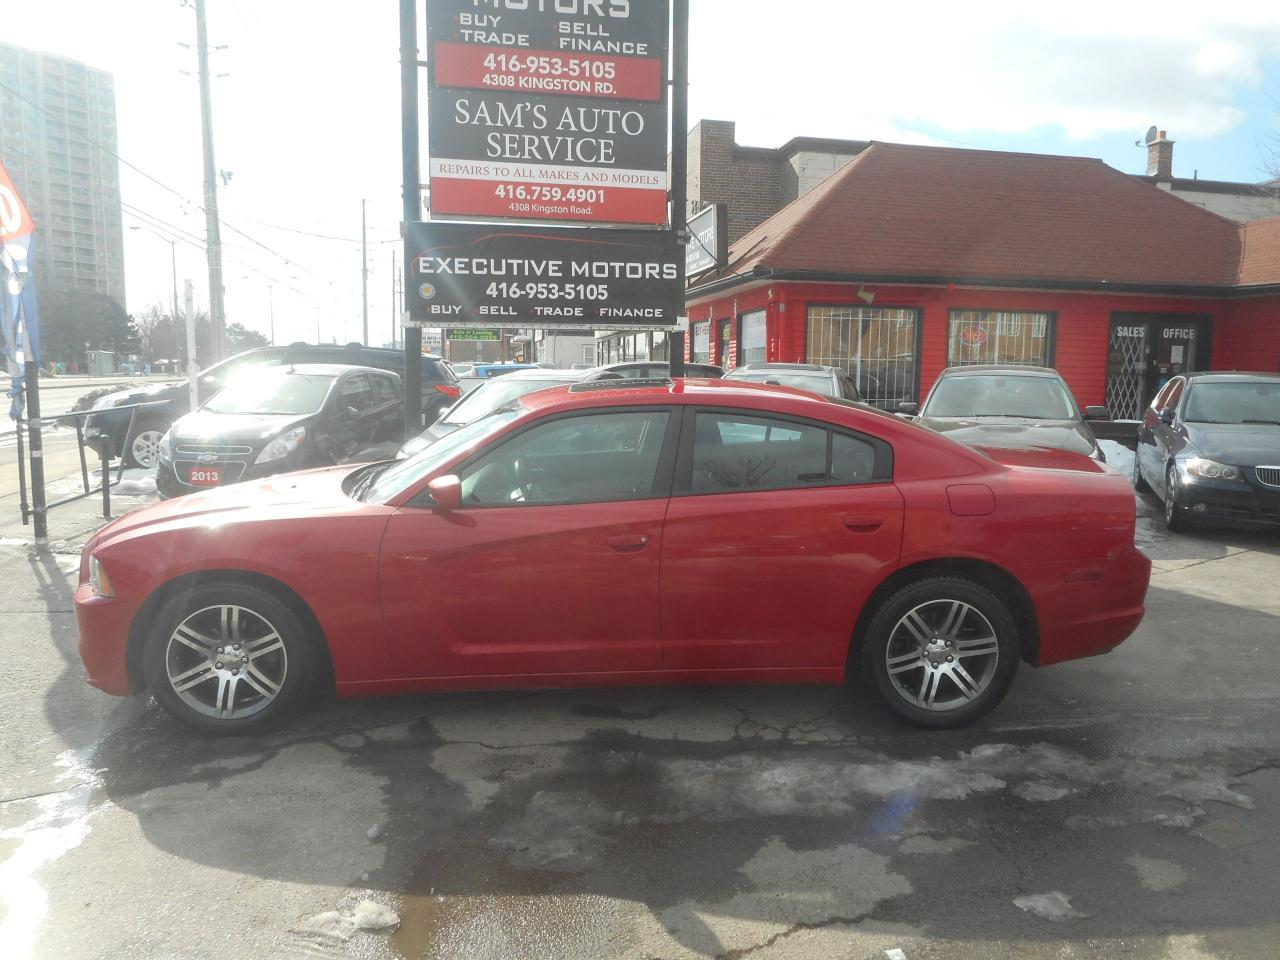 2012 Dodge Charger SXT loaded